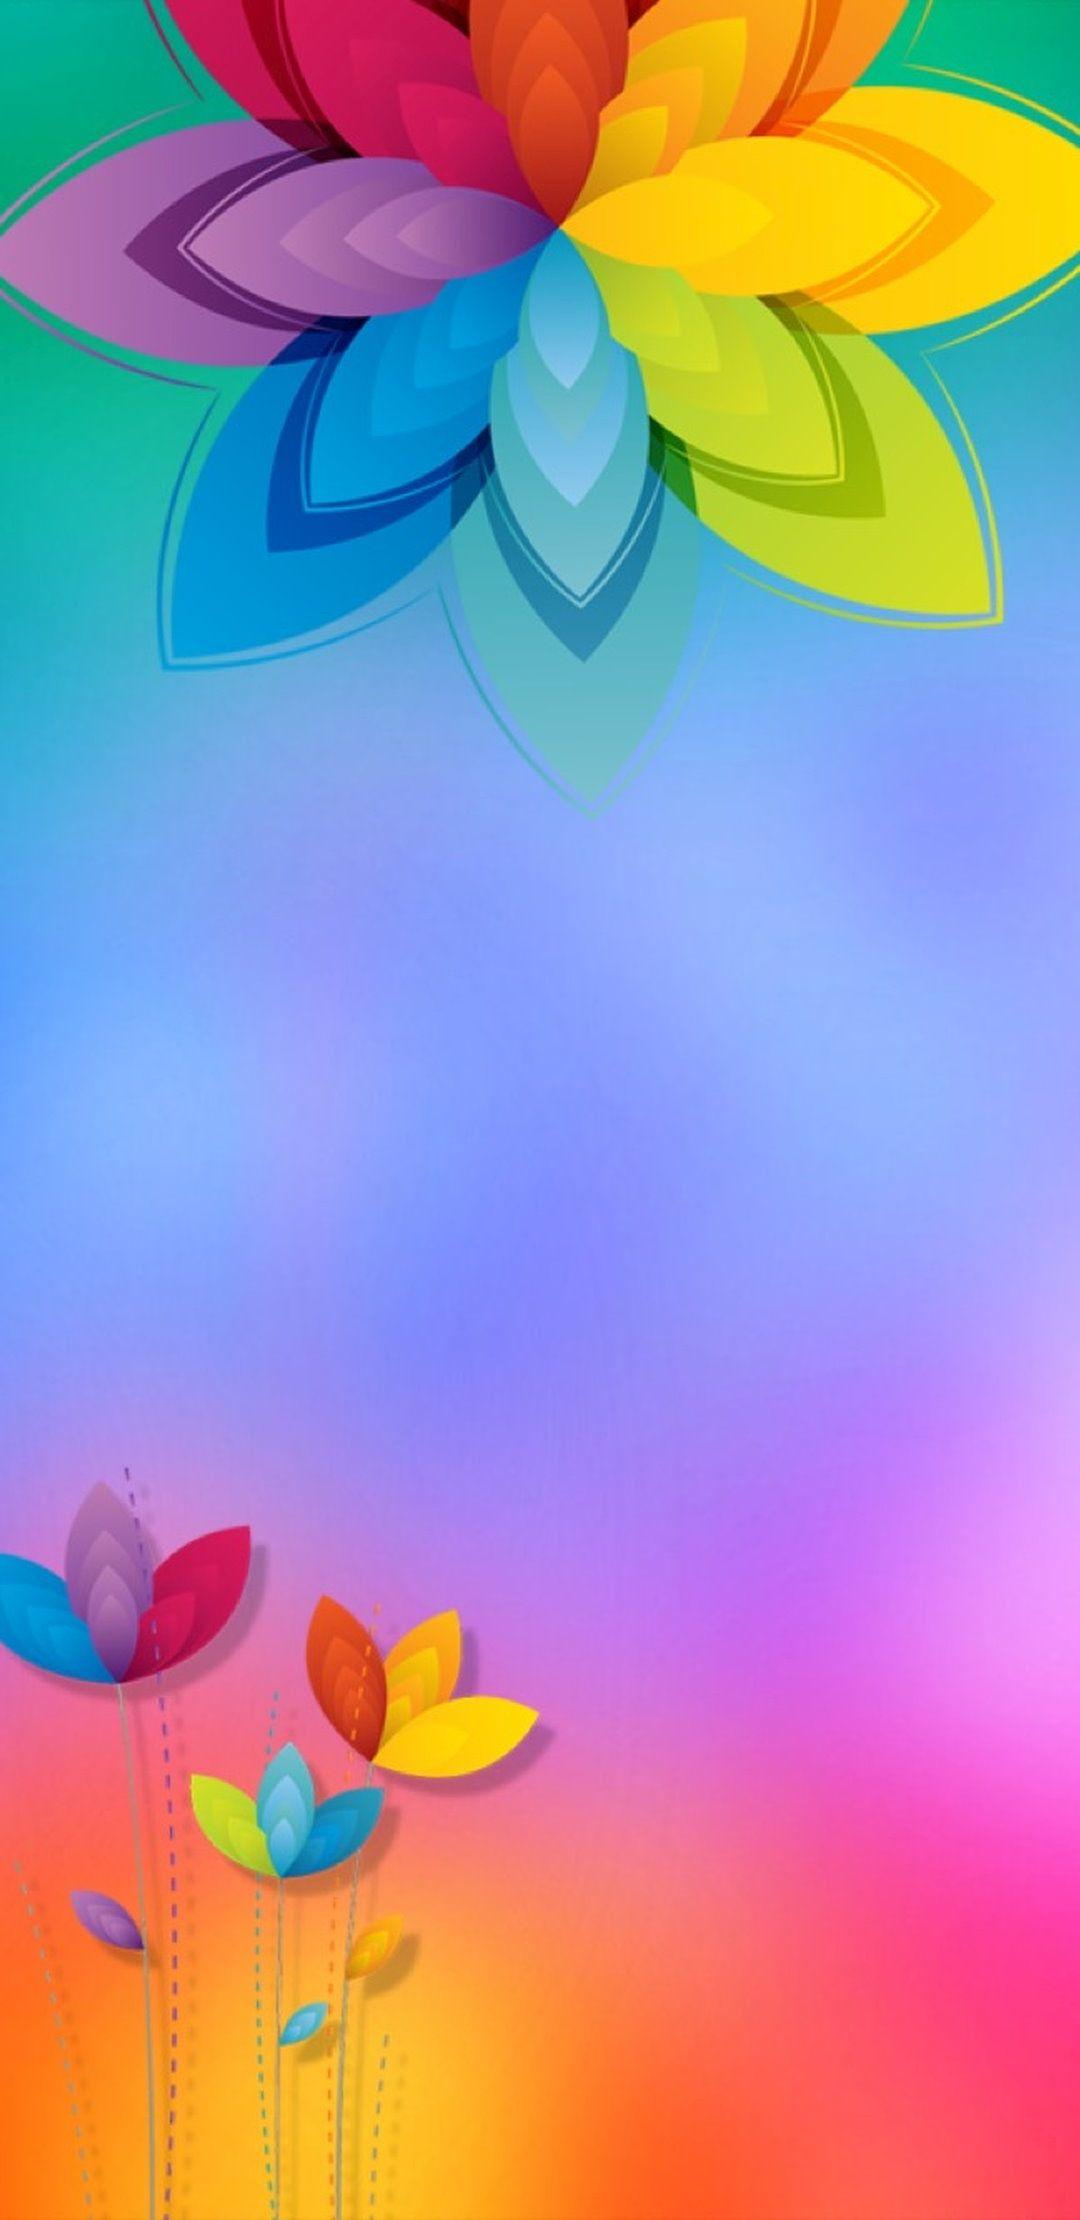 Samsung Galaxy A8 Stock Wallpapers 6 Desktop Background Galaxy A8